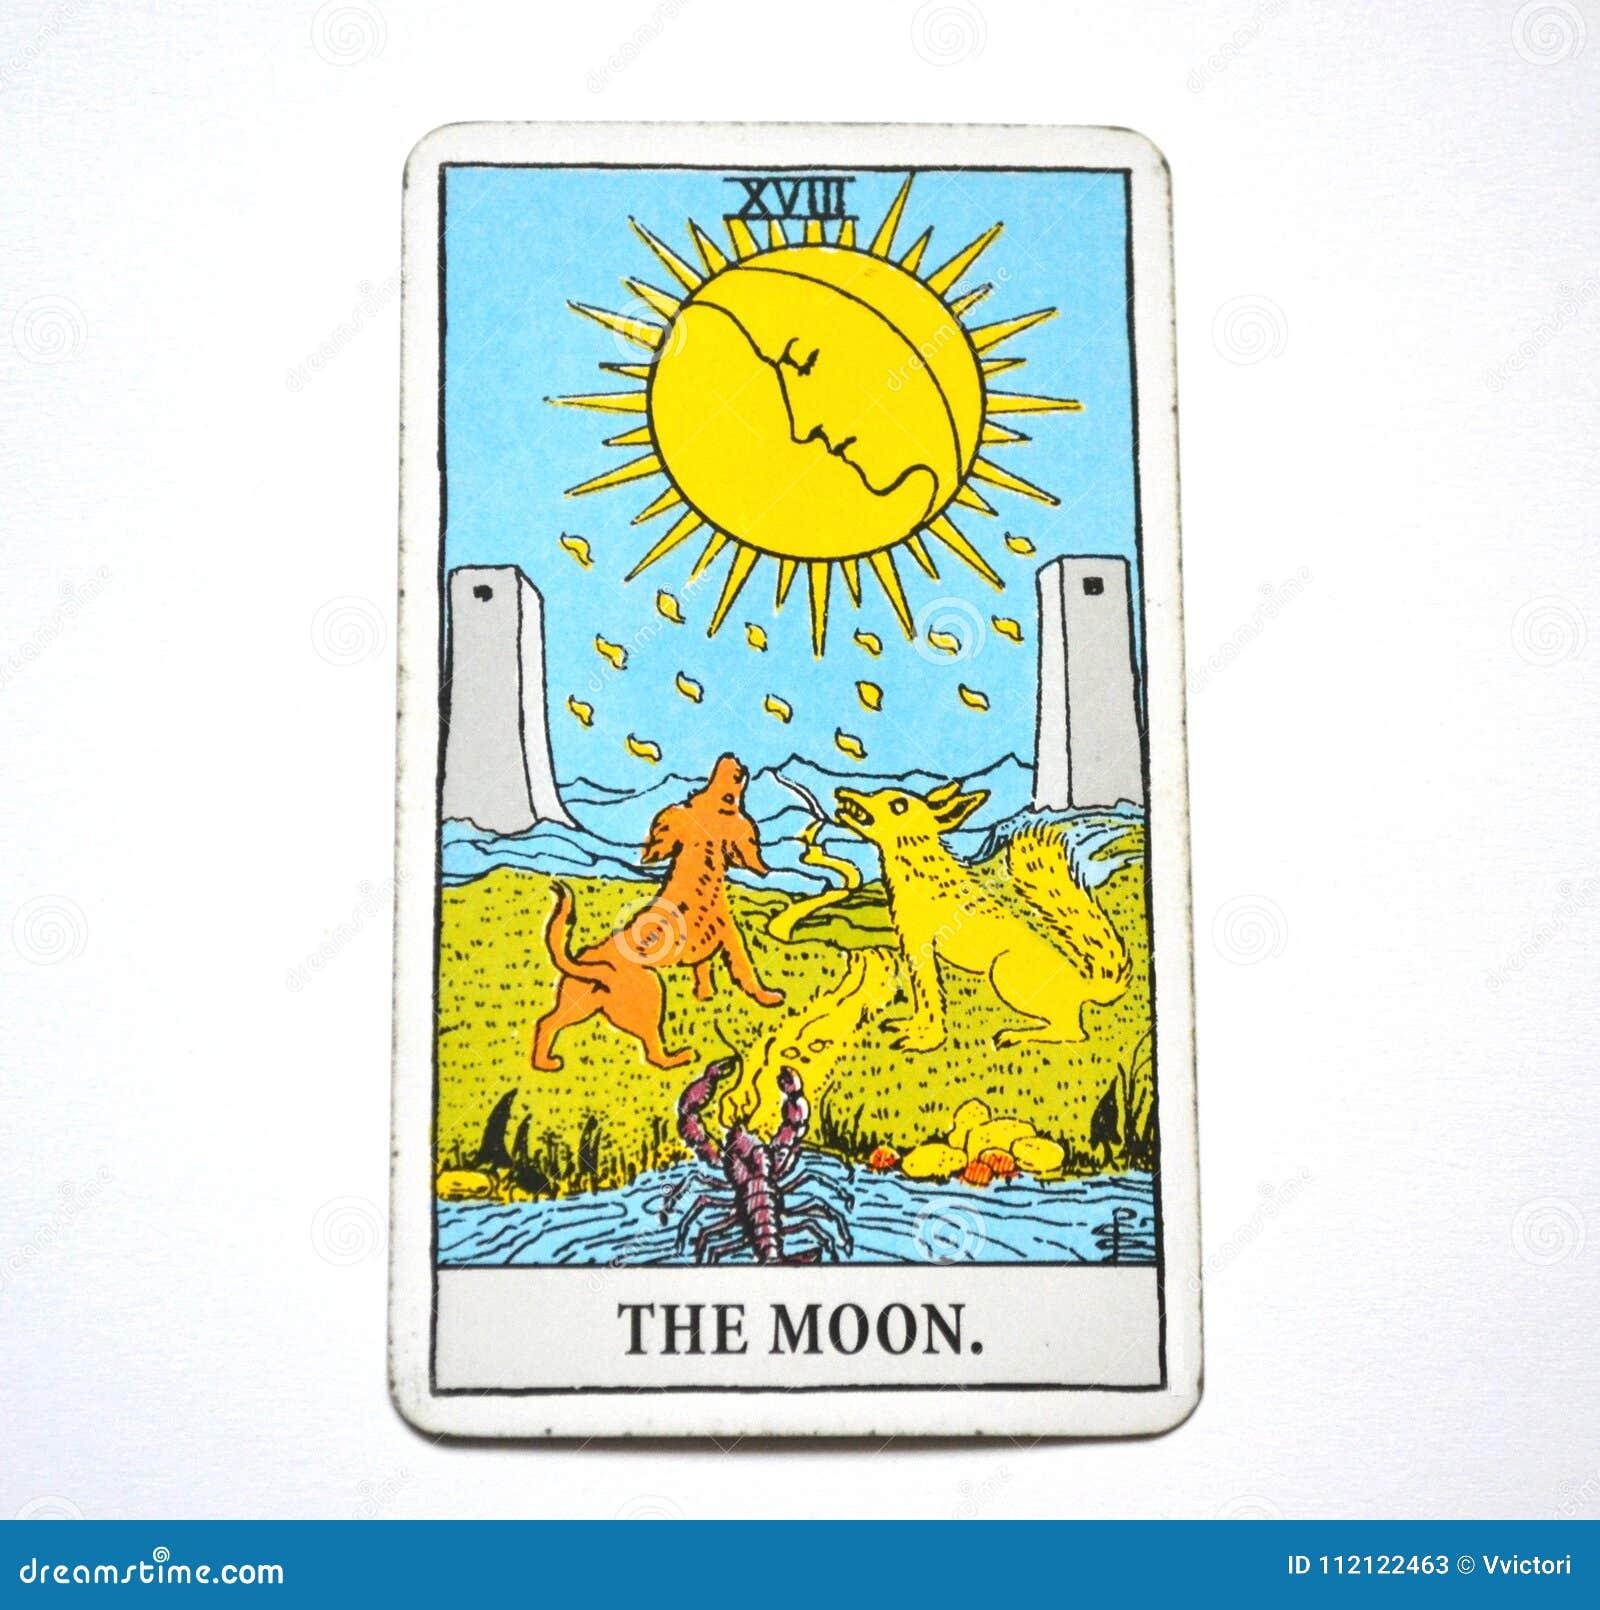 The Moon Tarot Card Dreams, nightmares, illusion, hidden things